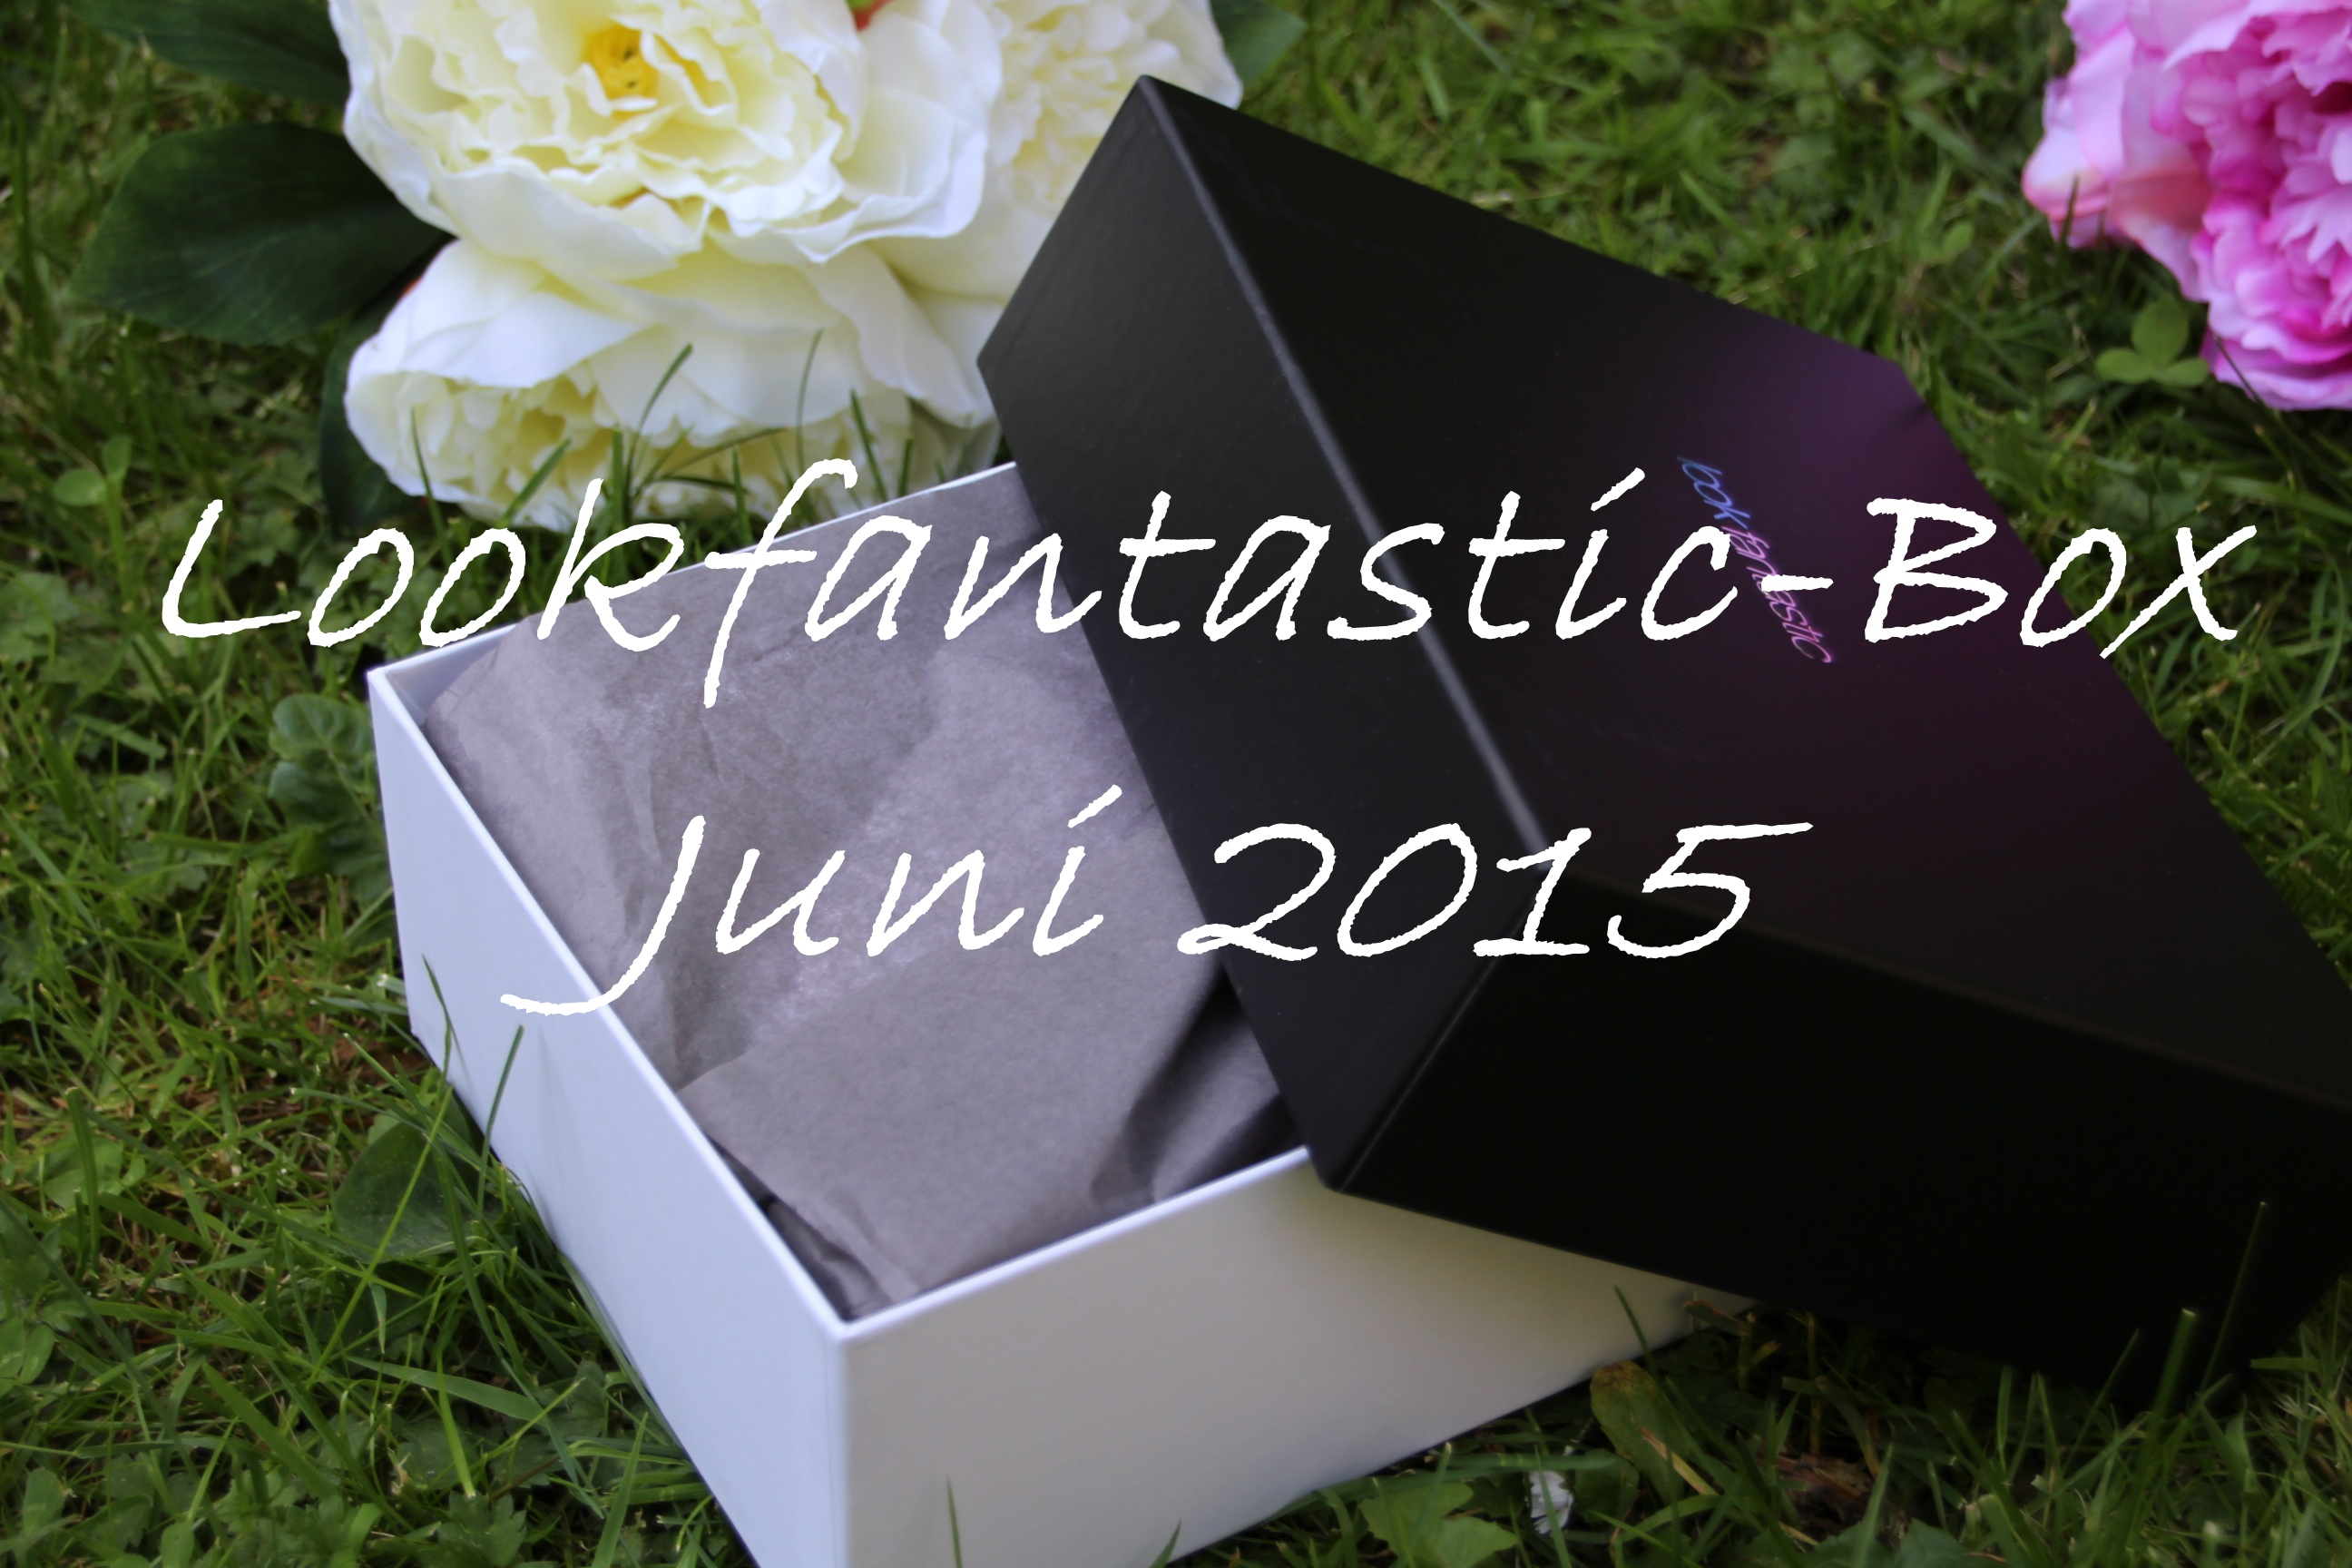 Lookfantastic-Box im Juni 2015